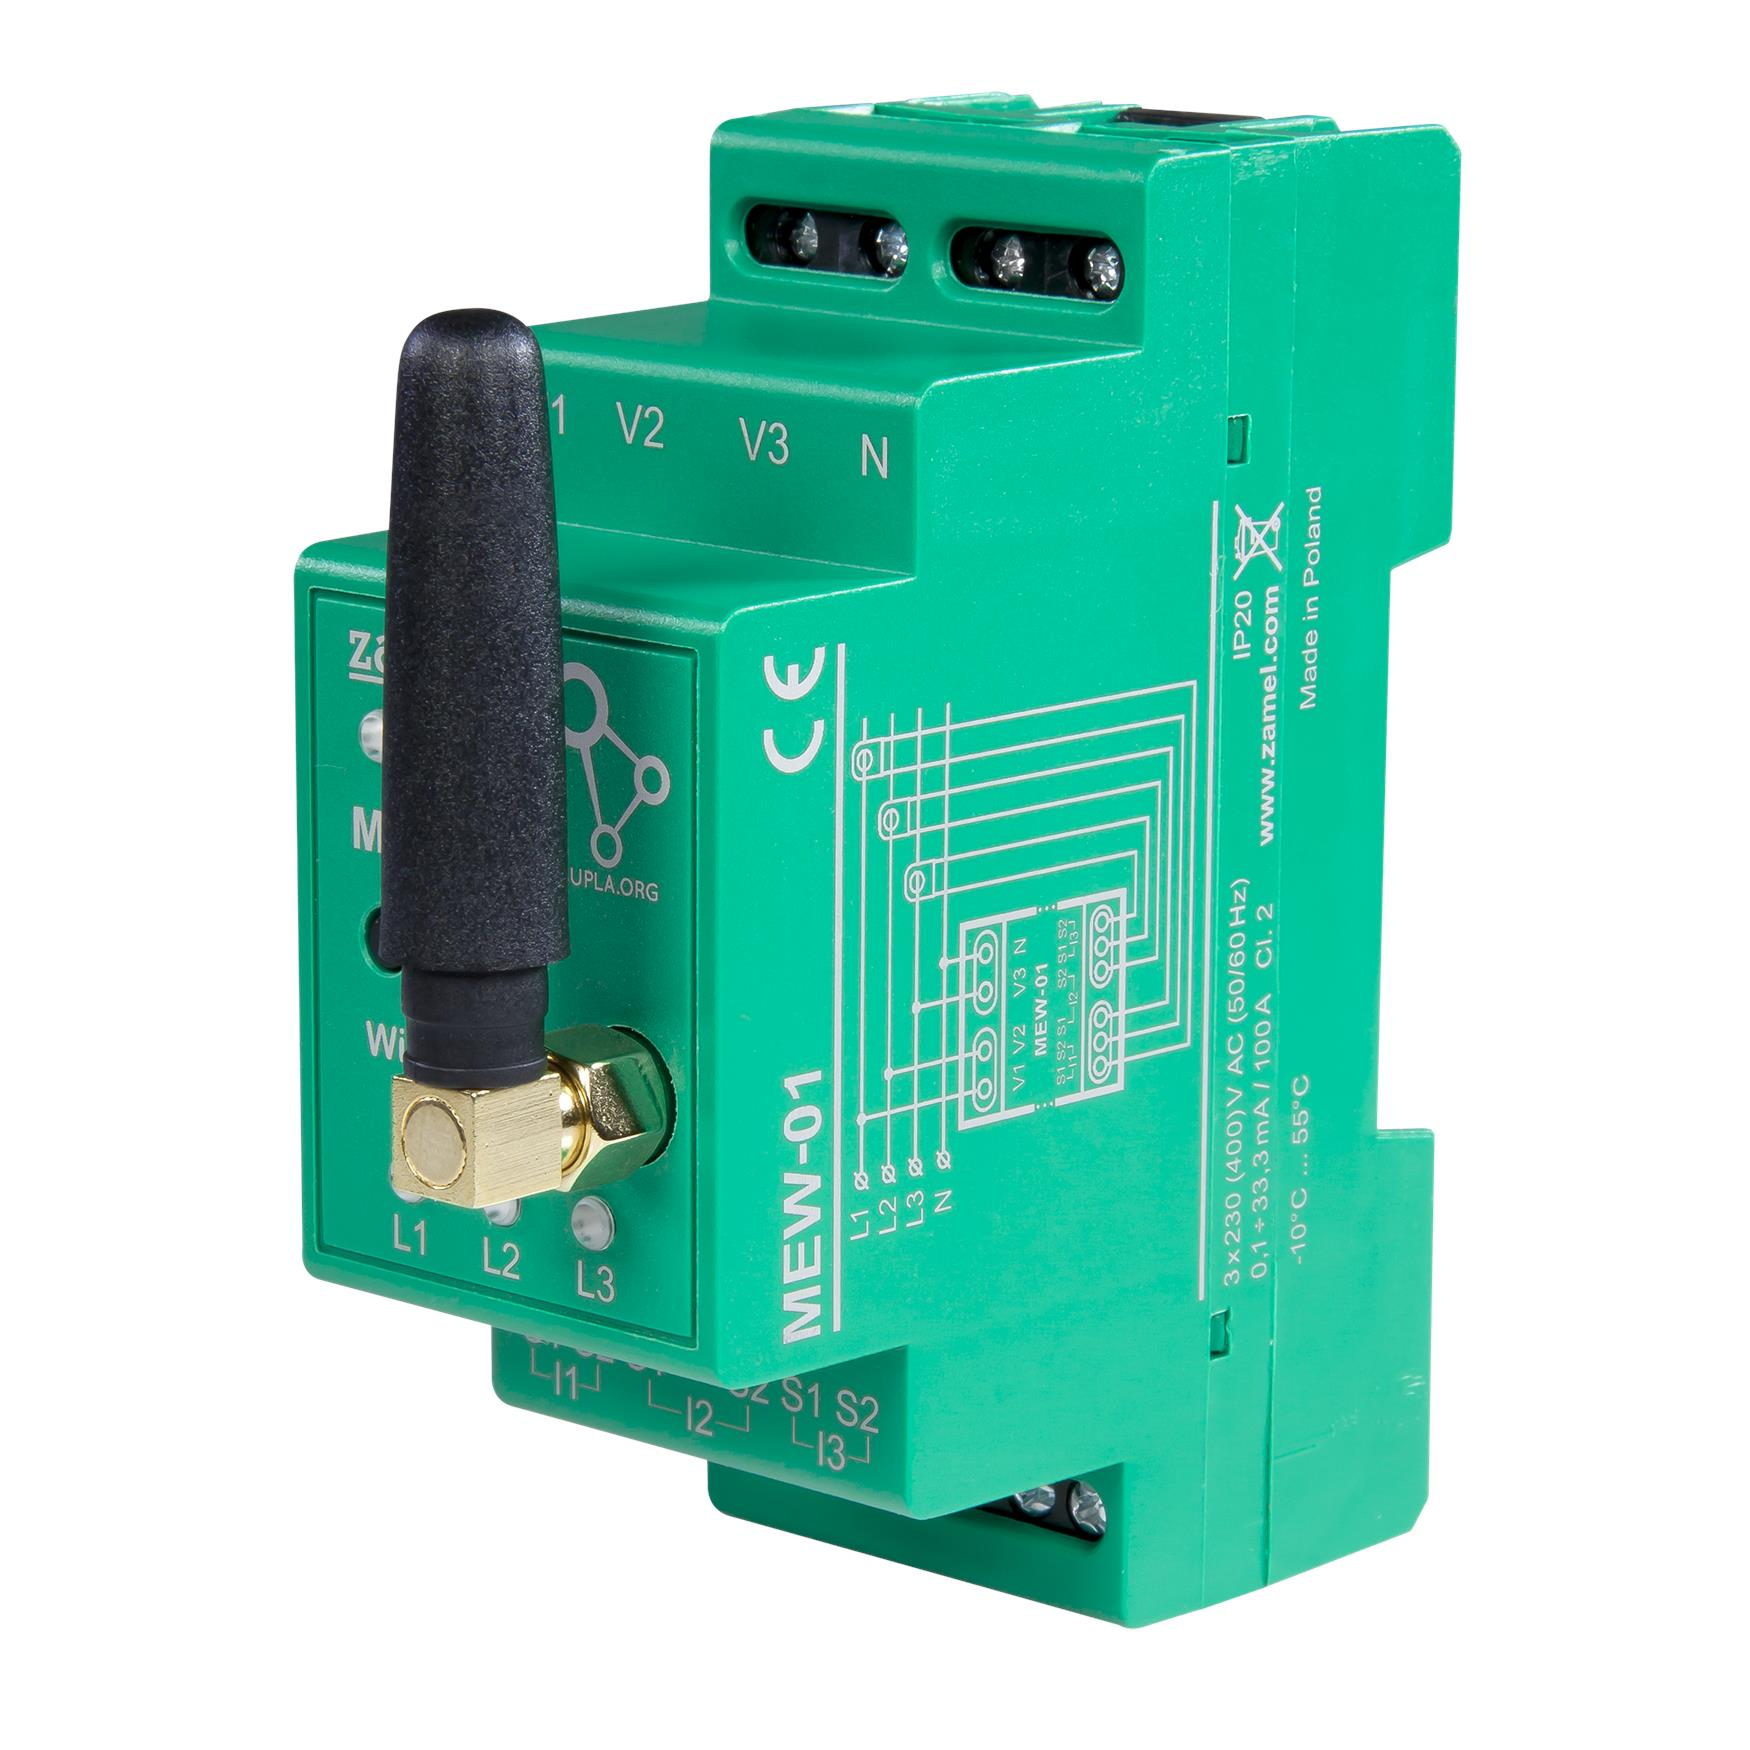 SUPLA_MEW-01-1F_Monitor_energii_elektrycznej_03